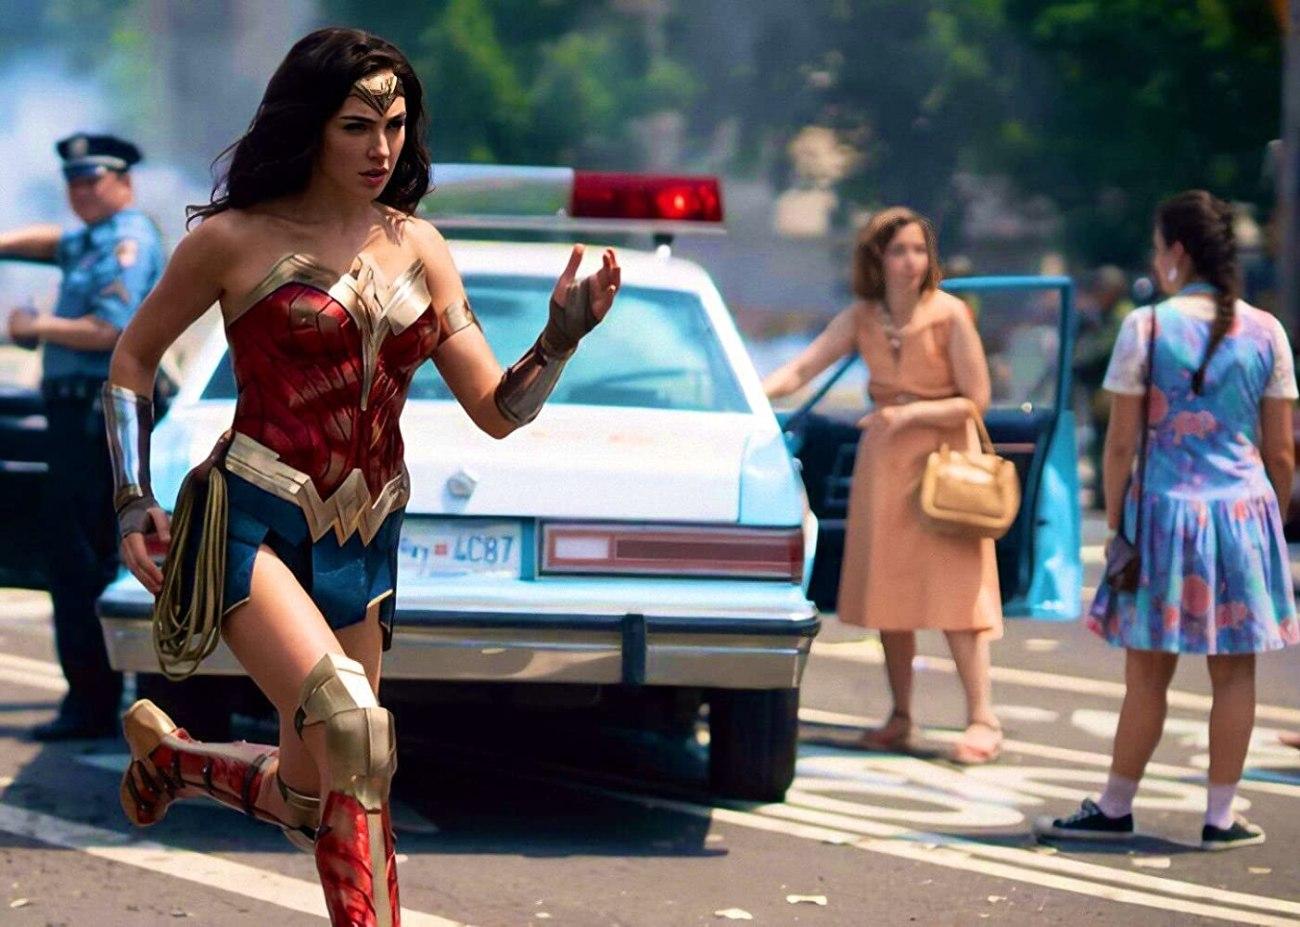 Gal Gadot como Wonder Woman en Wonder Woman 1984 (2020). Imagen: IMDb.com